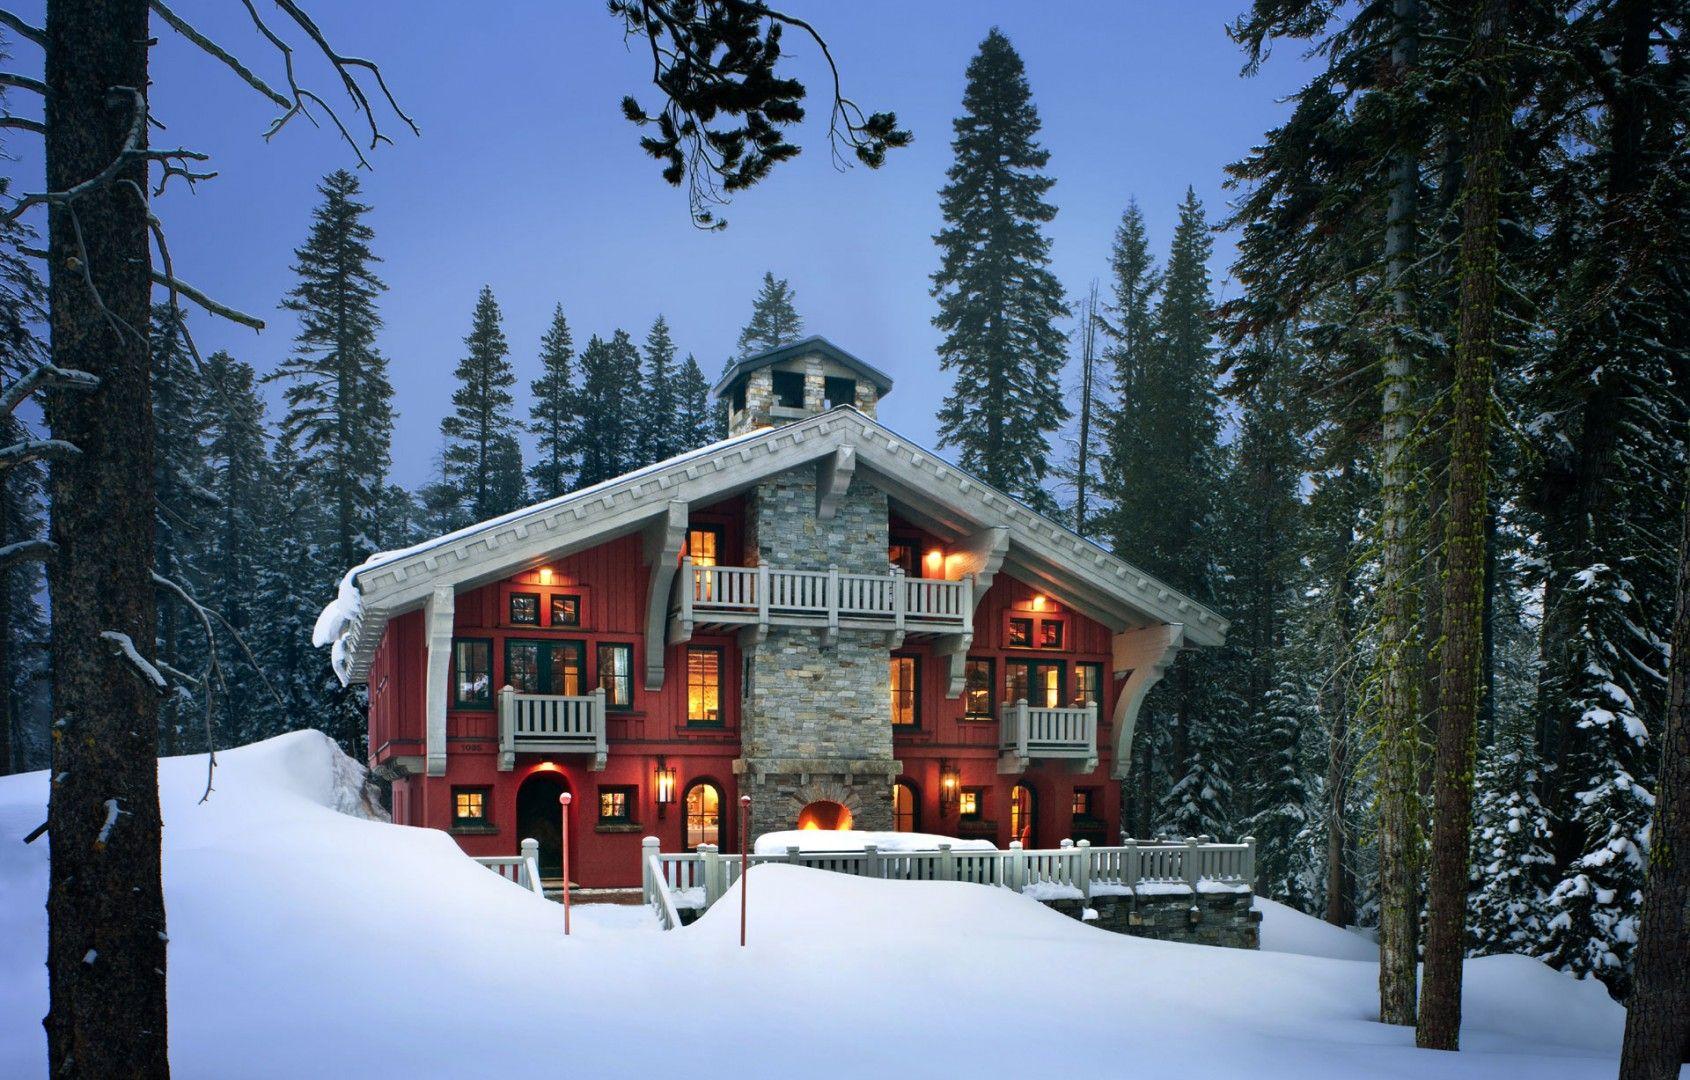 Alpine Ski Chalet- House In Snow Architect John Malick